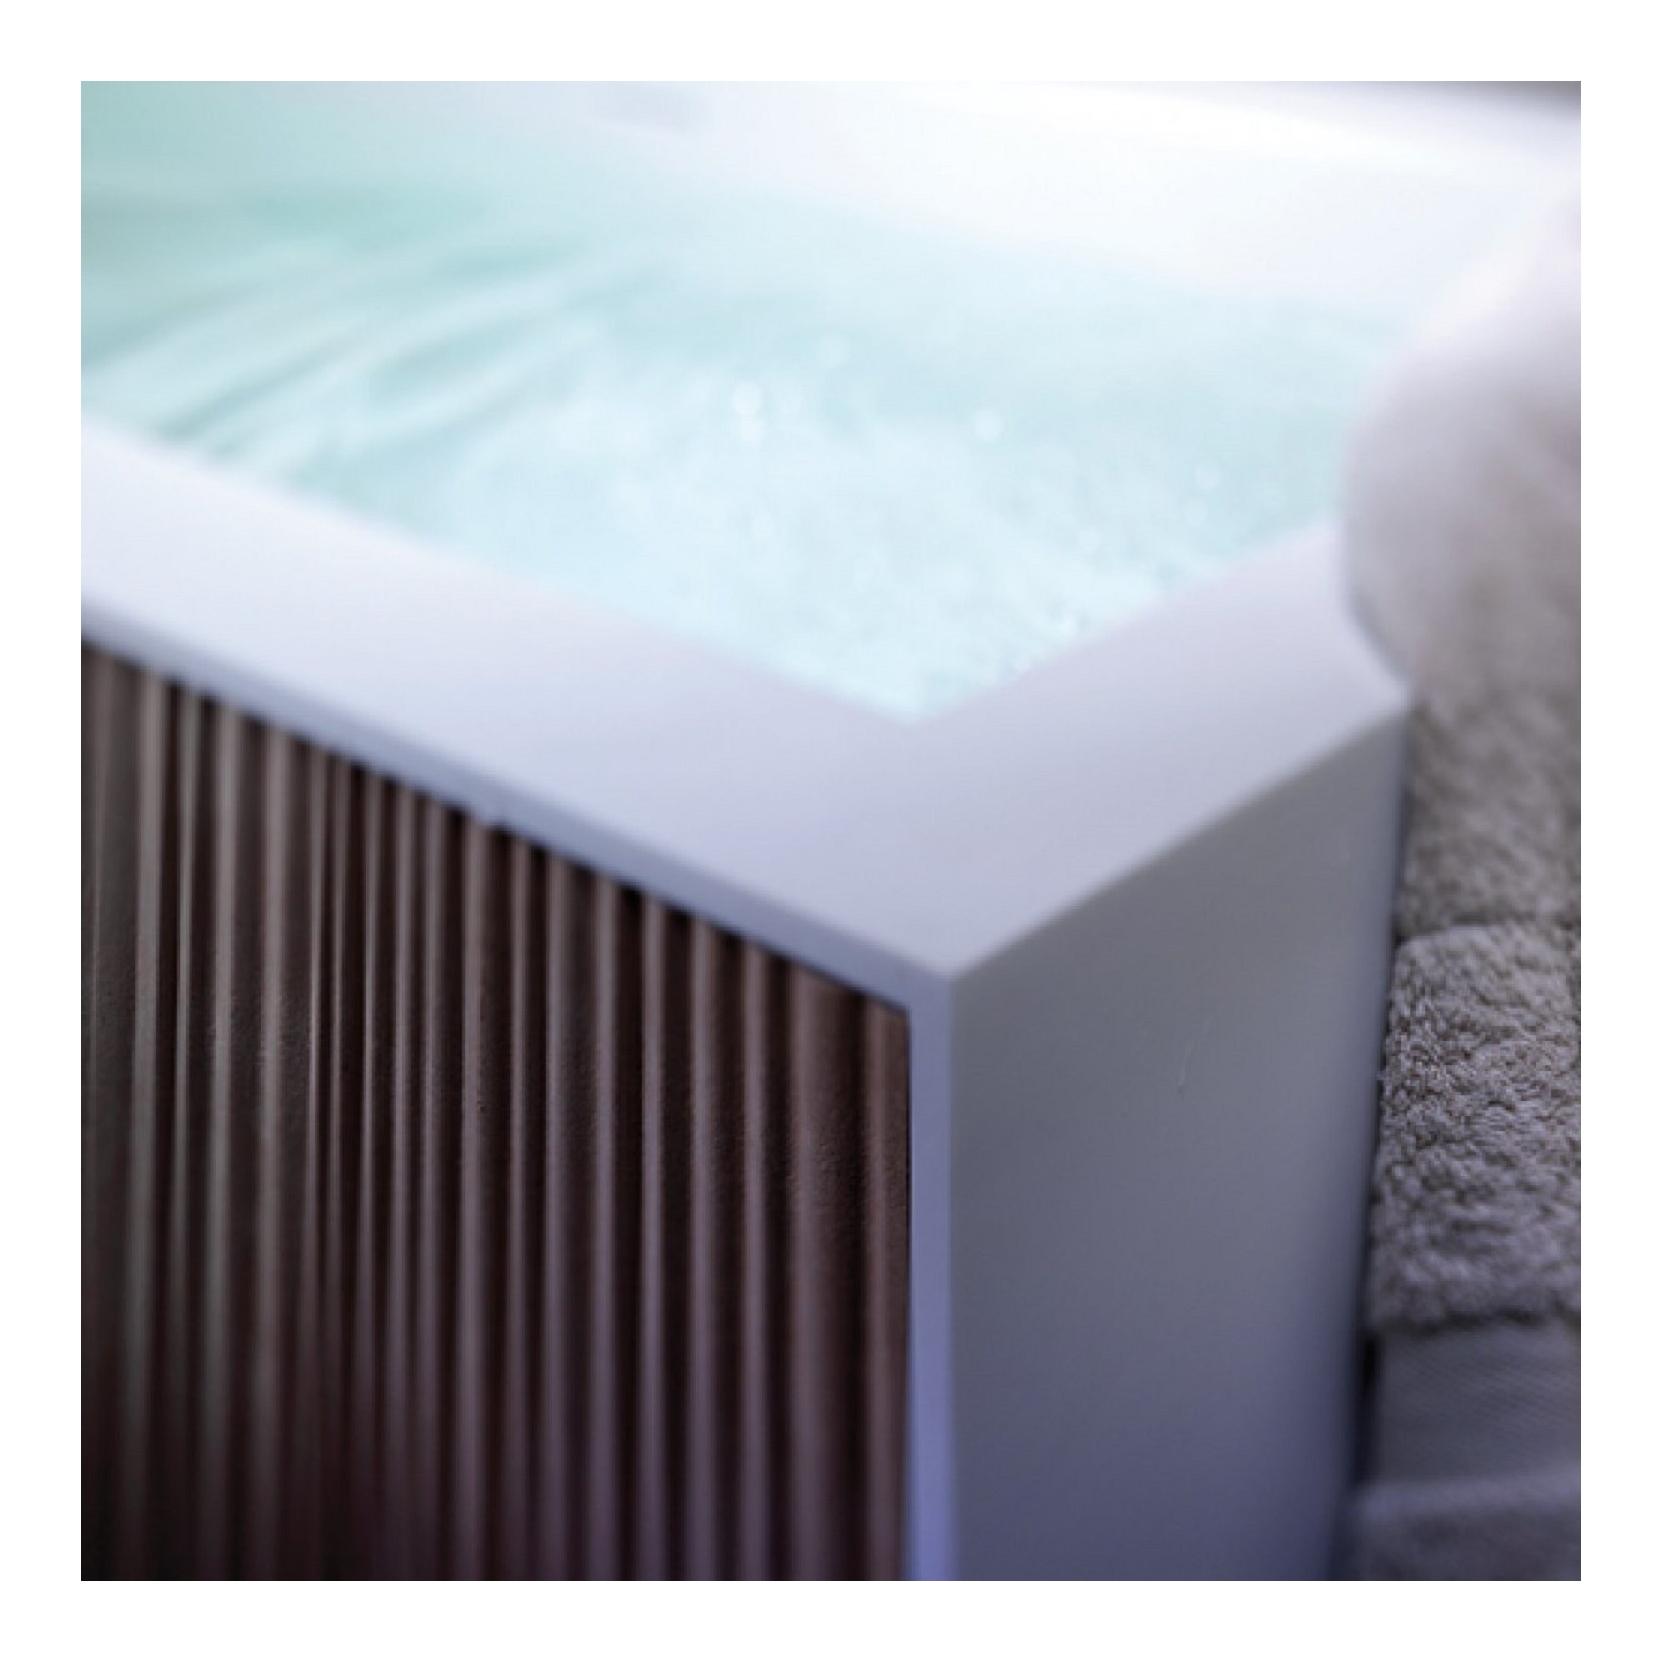 BLUBLEU VEER BATHTUB WITH PANELS RULE - TattaHome